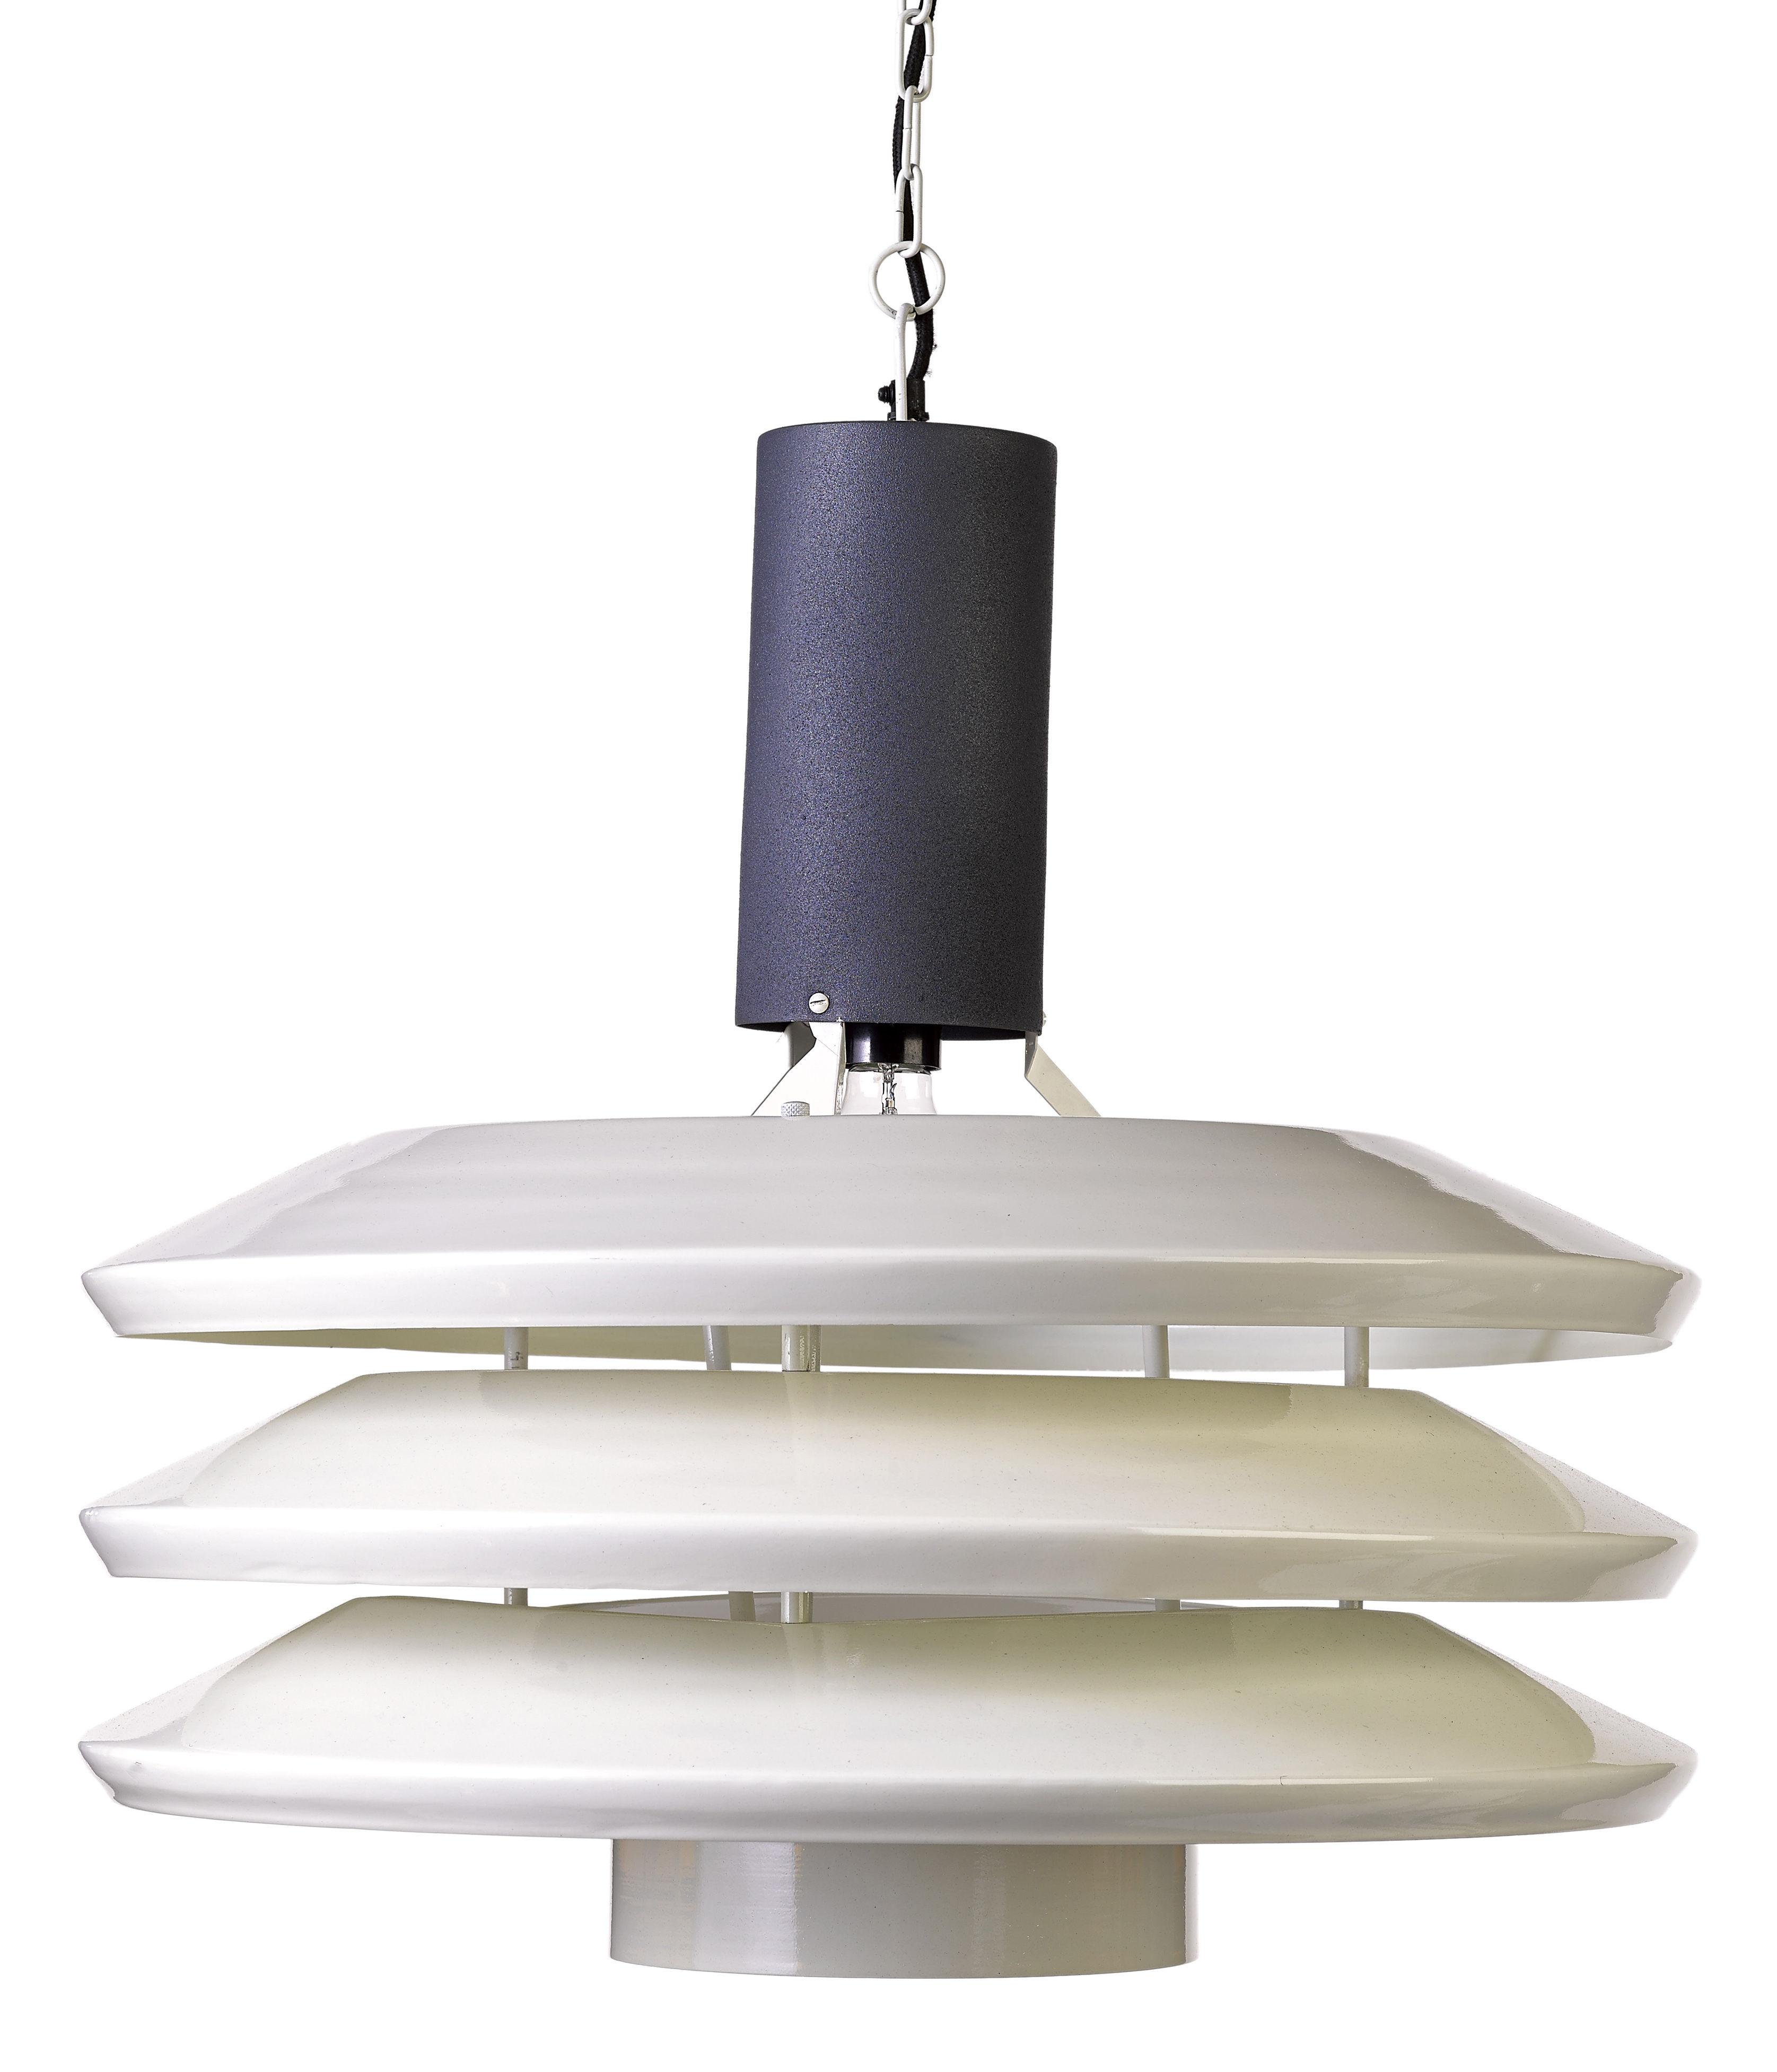 pluto gro 60 cm pols potten pendelleuchte. Black Bedroom Furniture Sets. Home Design Ideas